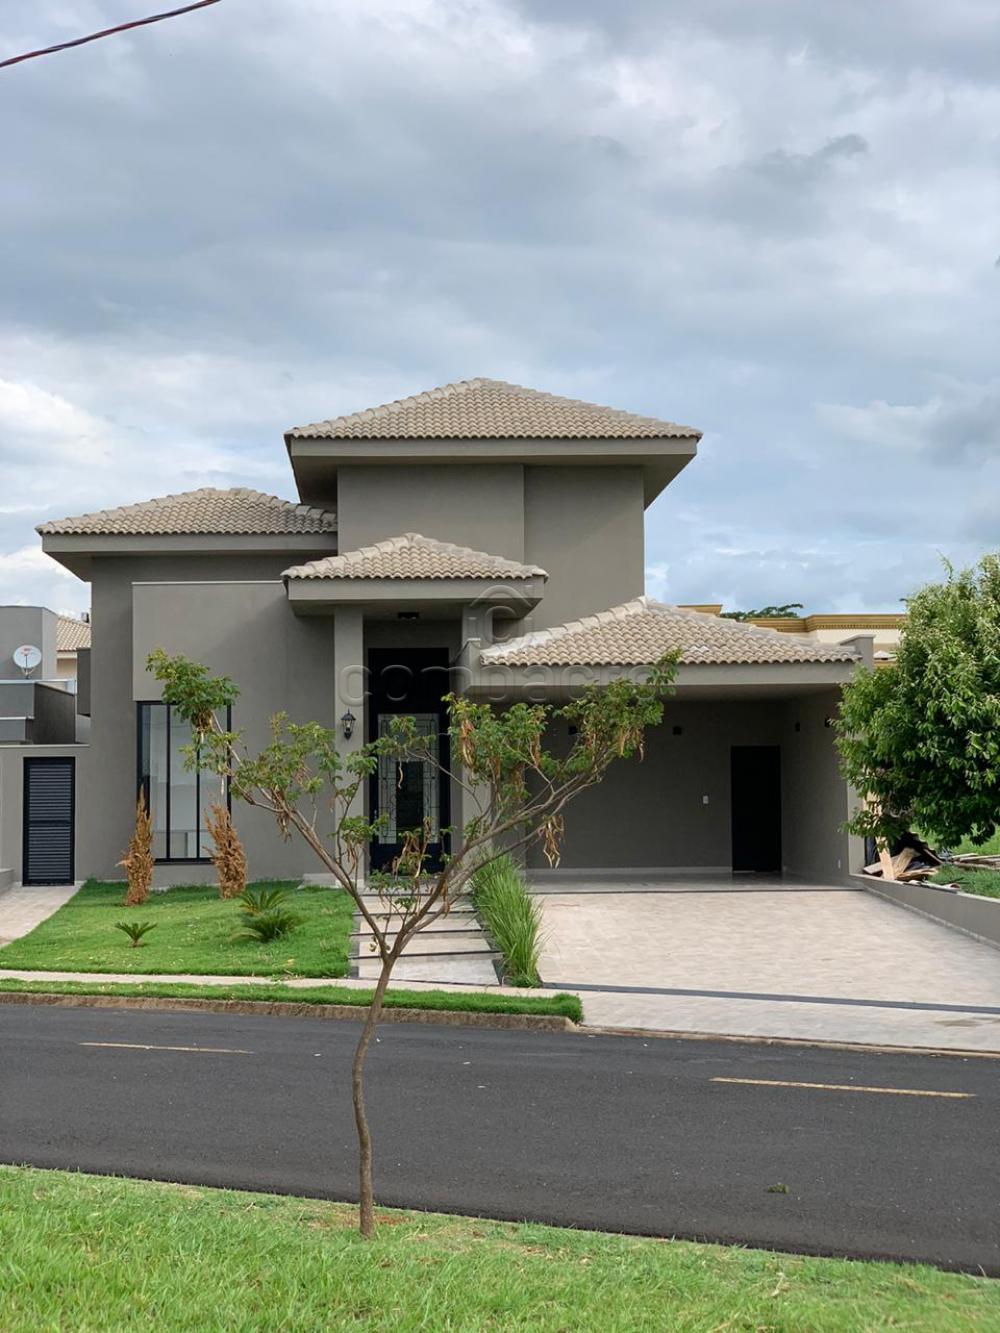 Sao Jose do Rio Preto Casa Venda R$970.000,00 Condominio R$350,00 3 Dormitorios 3 Suites Area do terreno 480.00m2 Area construida 230.00m2